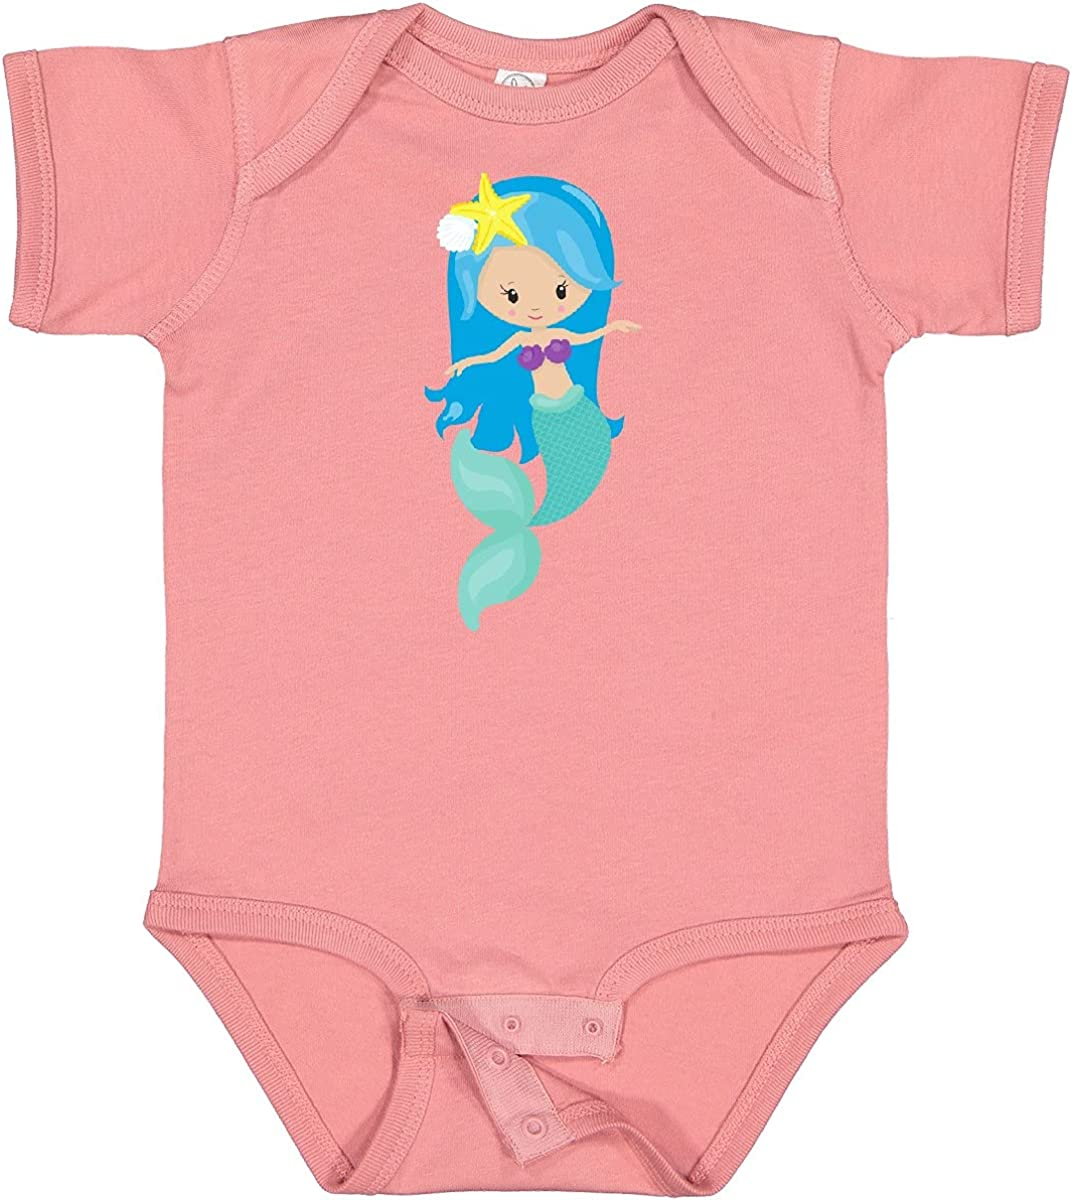 inktastic Cute Mermaid Little Same day shipping Infa Hair quality assurance Blue Starfish